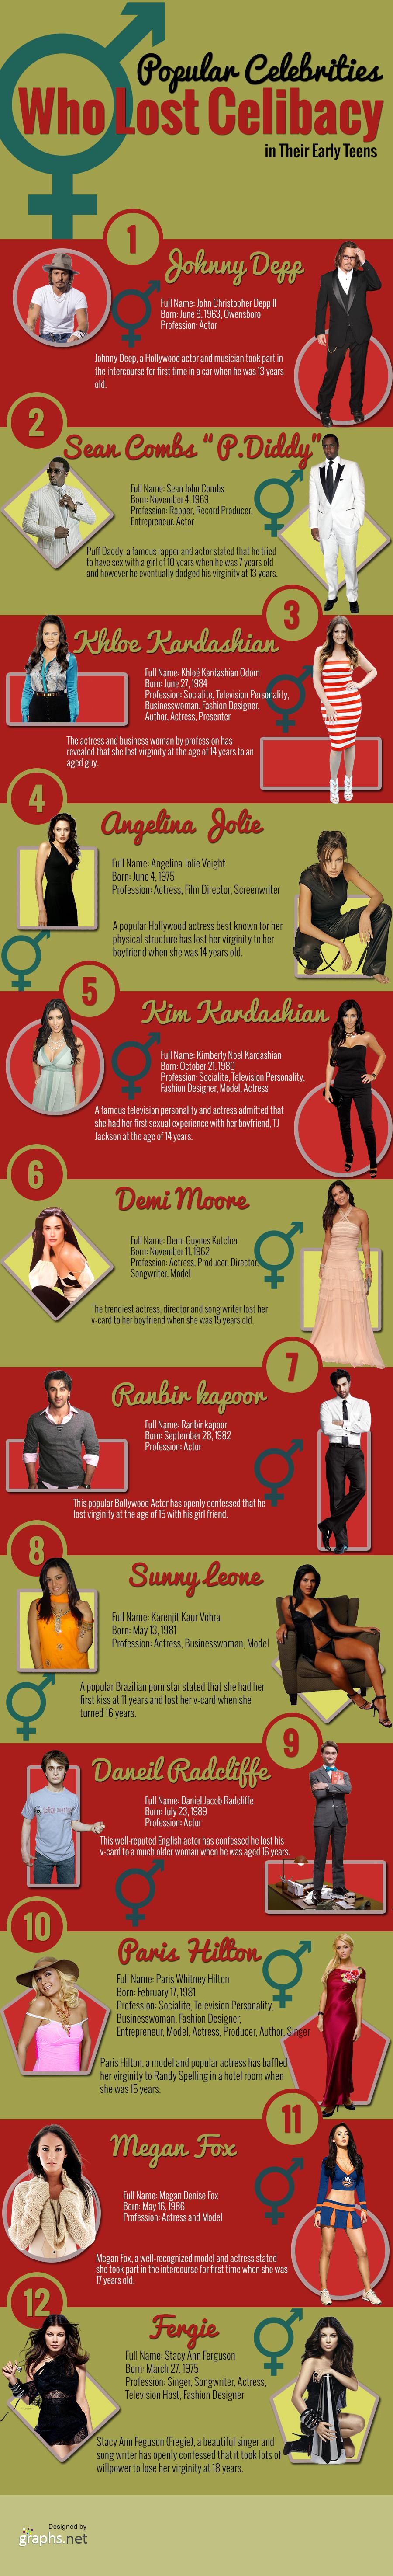 Popular Celebrities Who Last Celibacy in Their early teens